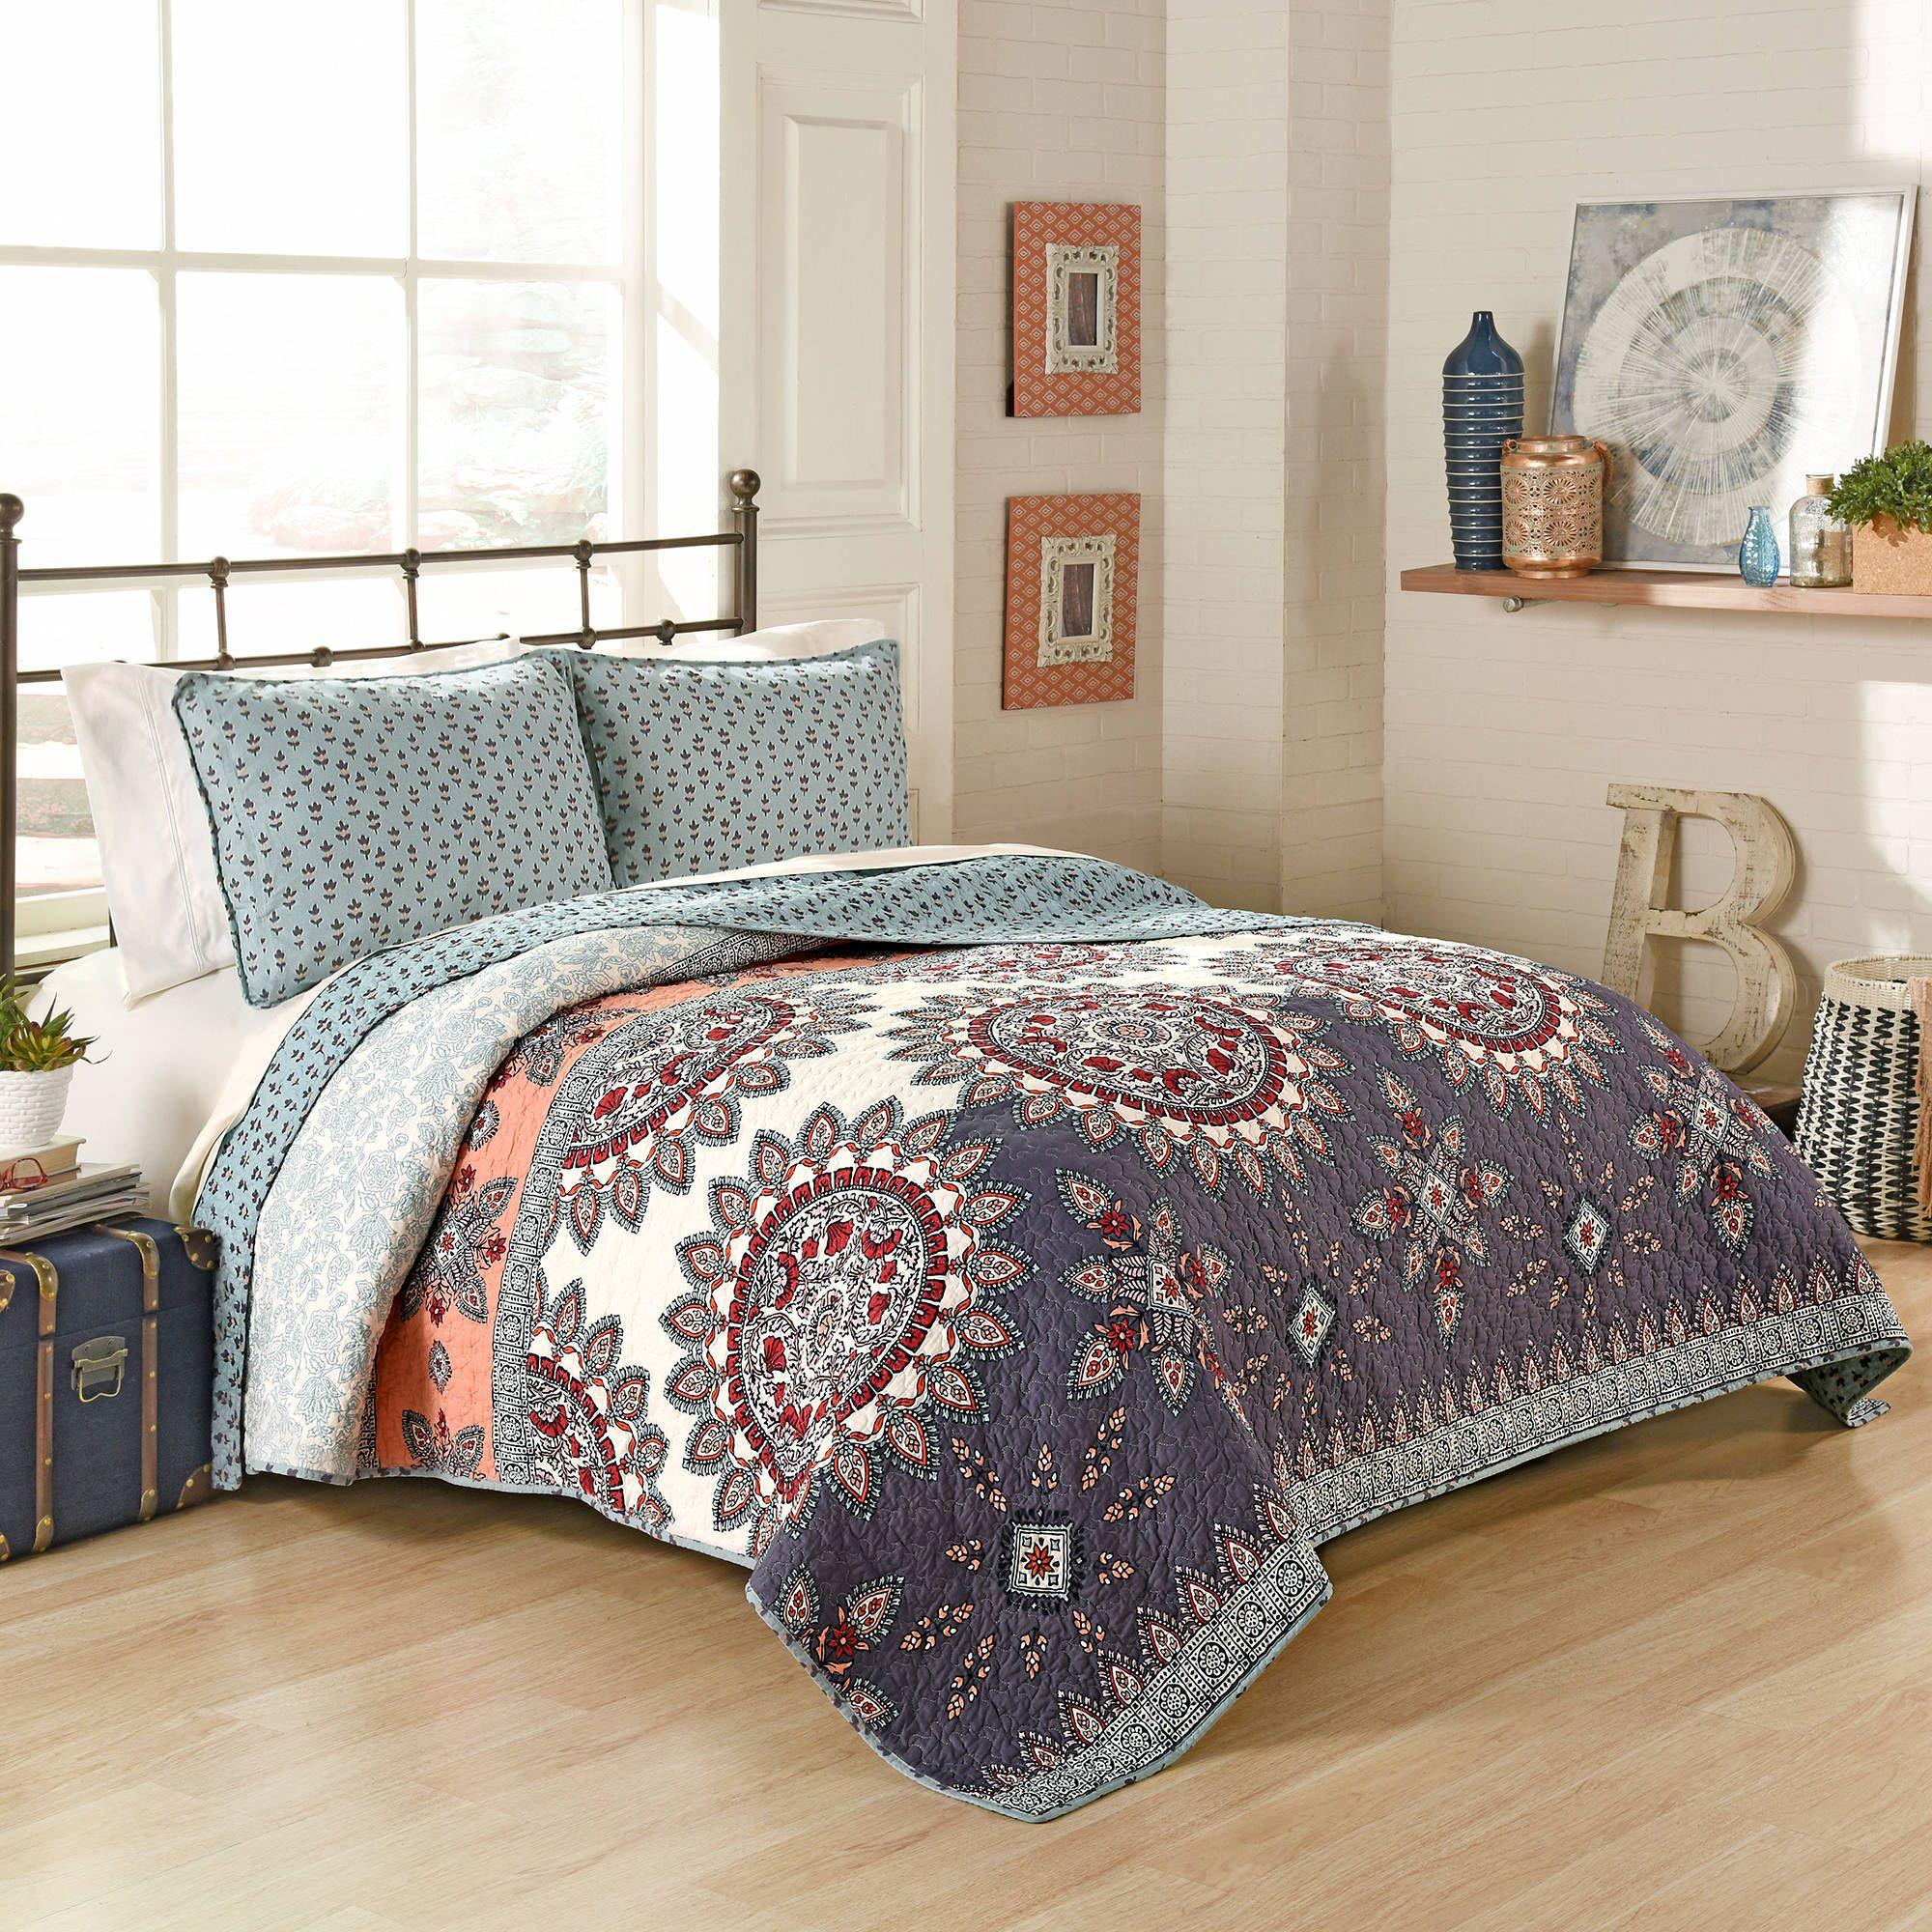 Better Homes and Gardens Moroccan Quilt, Jewel - Walmart.com ... : home and garden quilts - Adamdwight.com